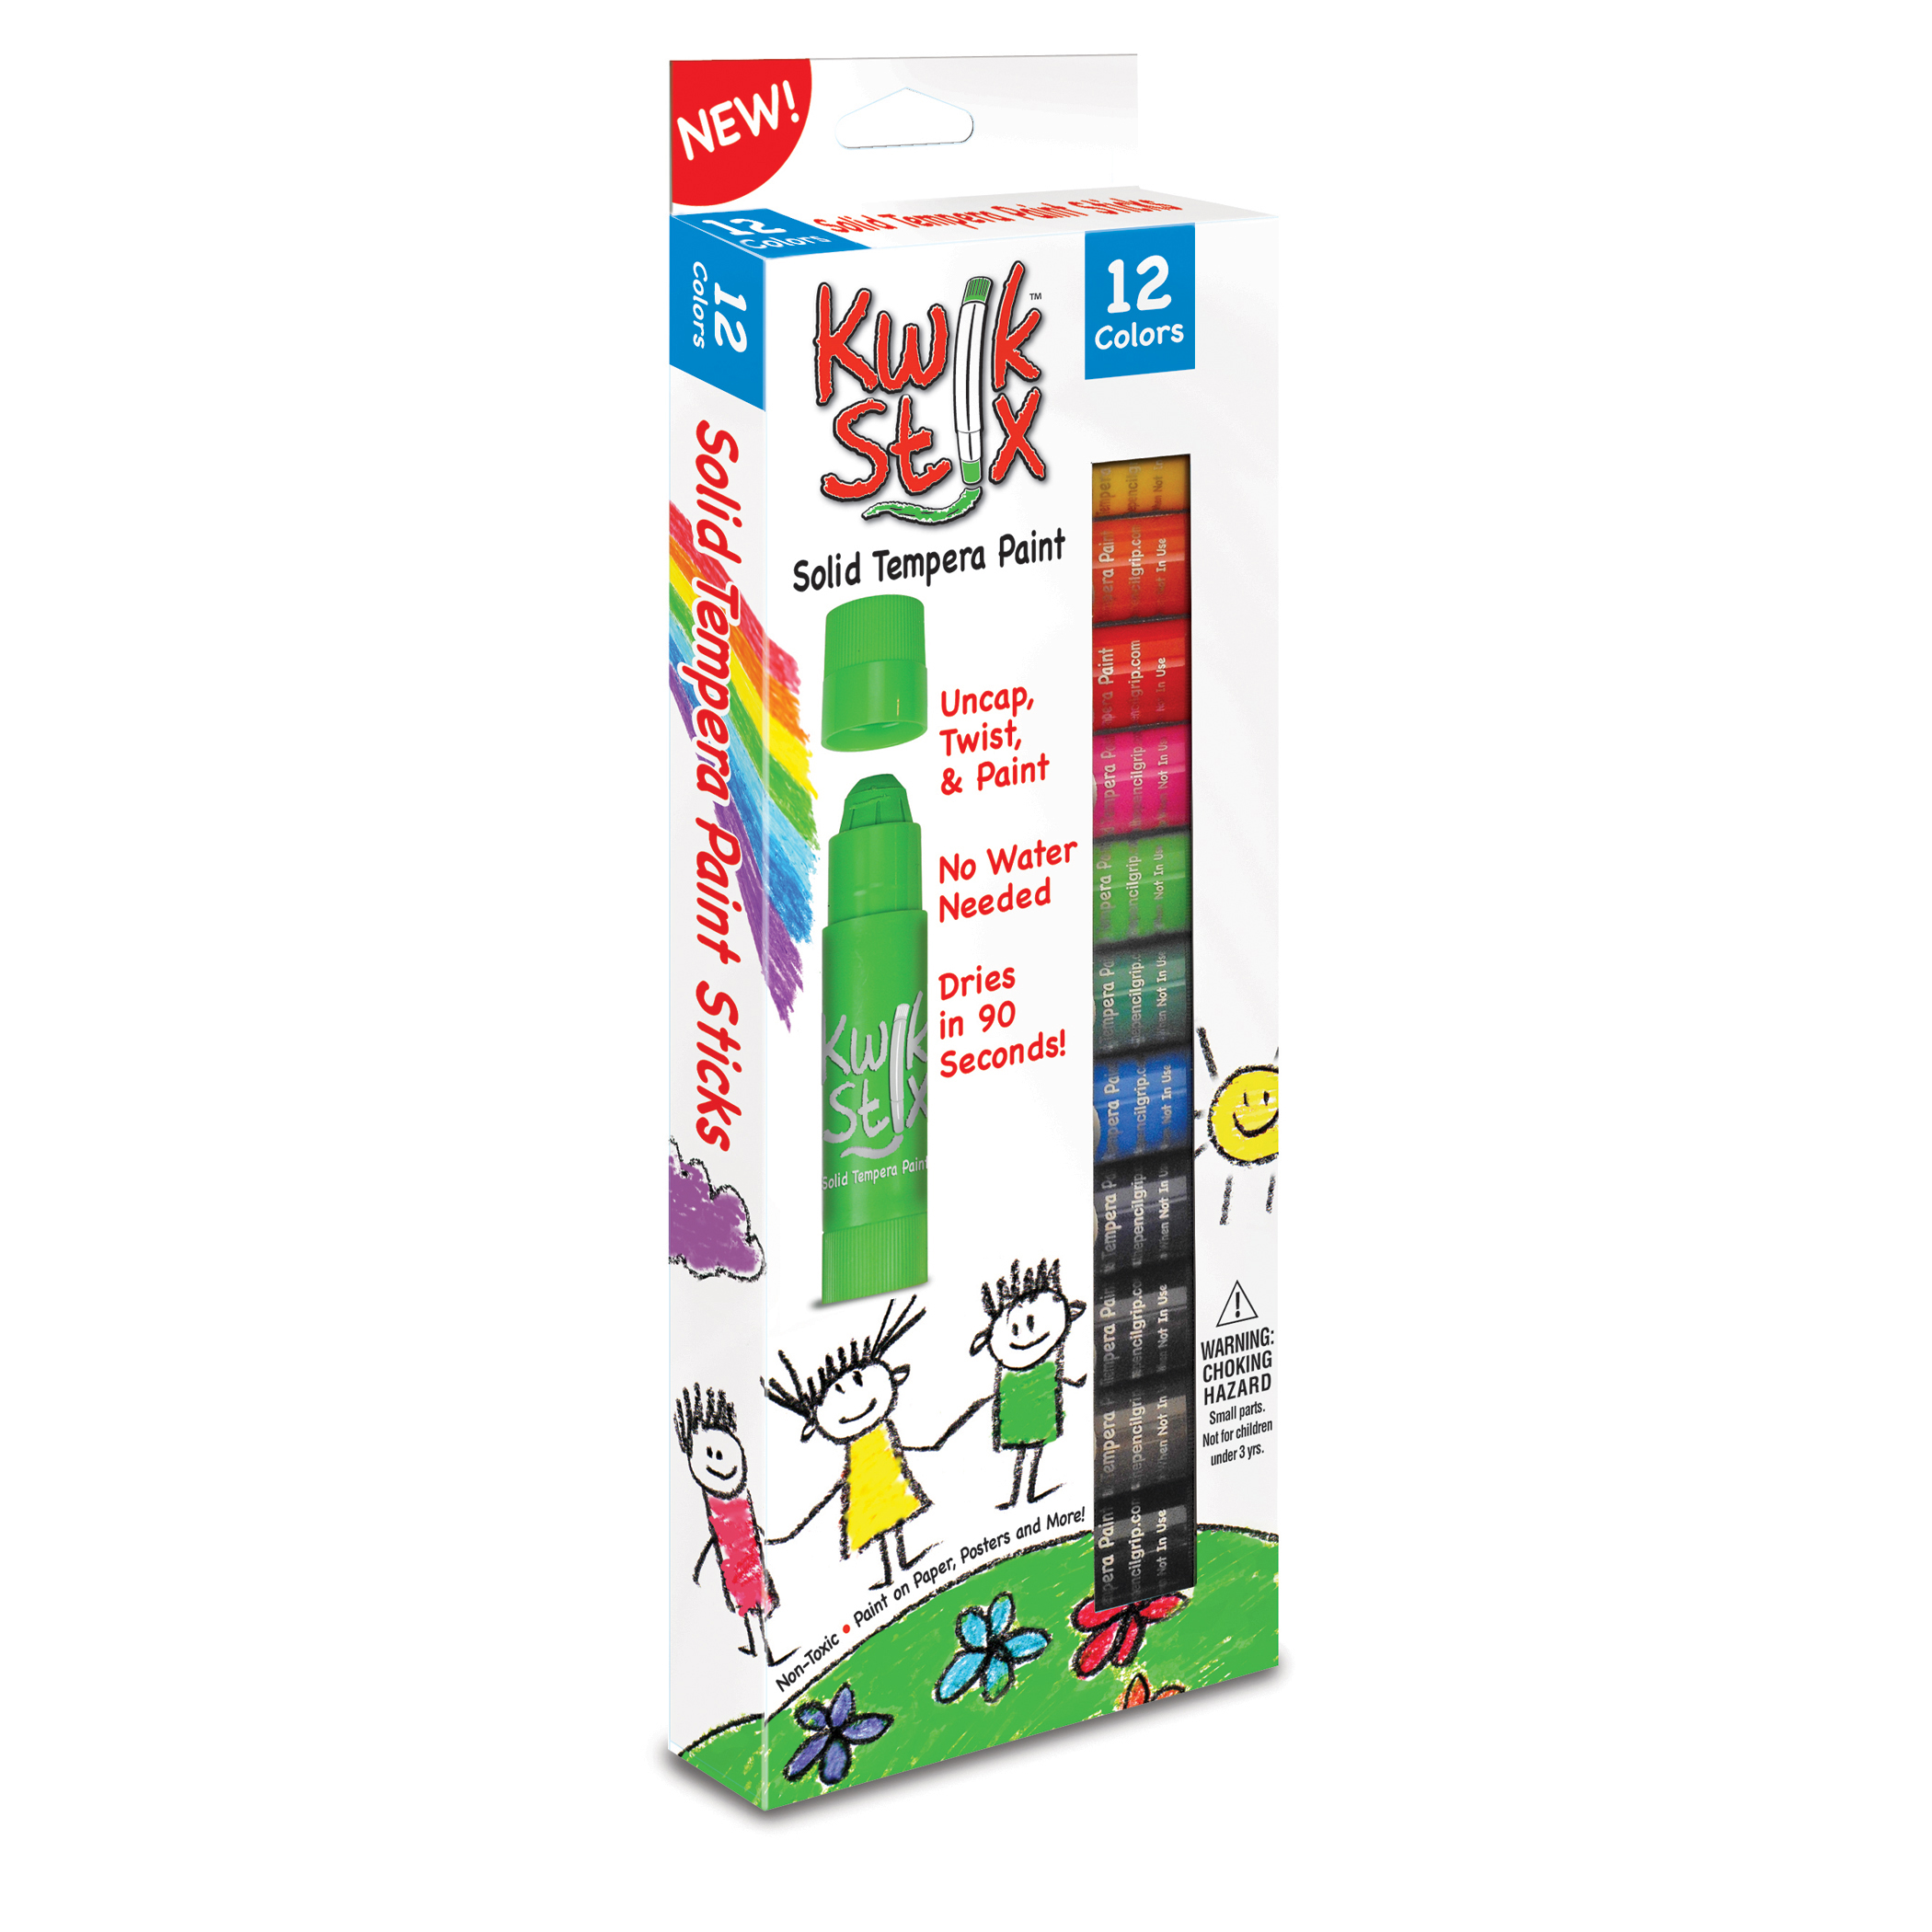 Kwik Stix Solid Tempera Paint Stick, 12 Primary Colors